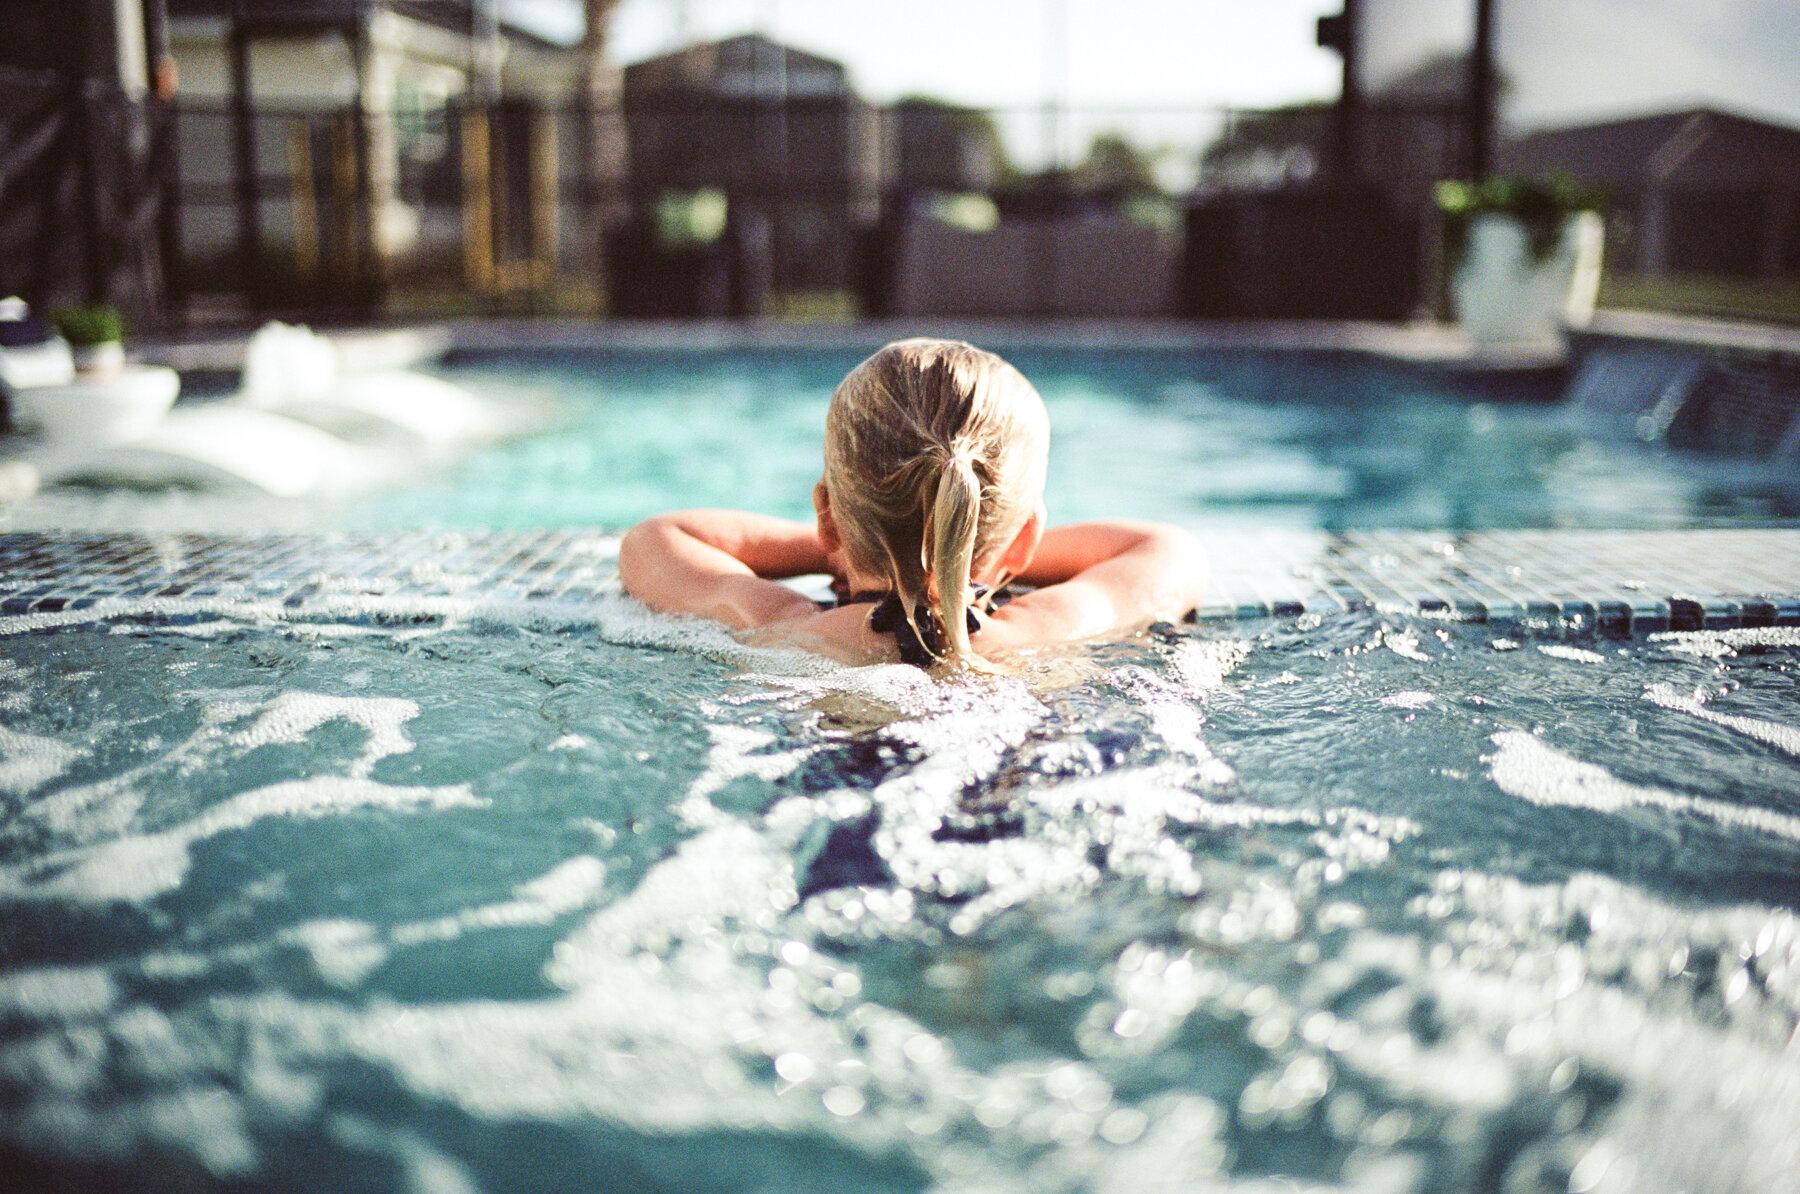 Leica-M6-Pool-Chloe-14-2.jpg